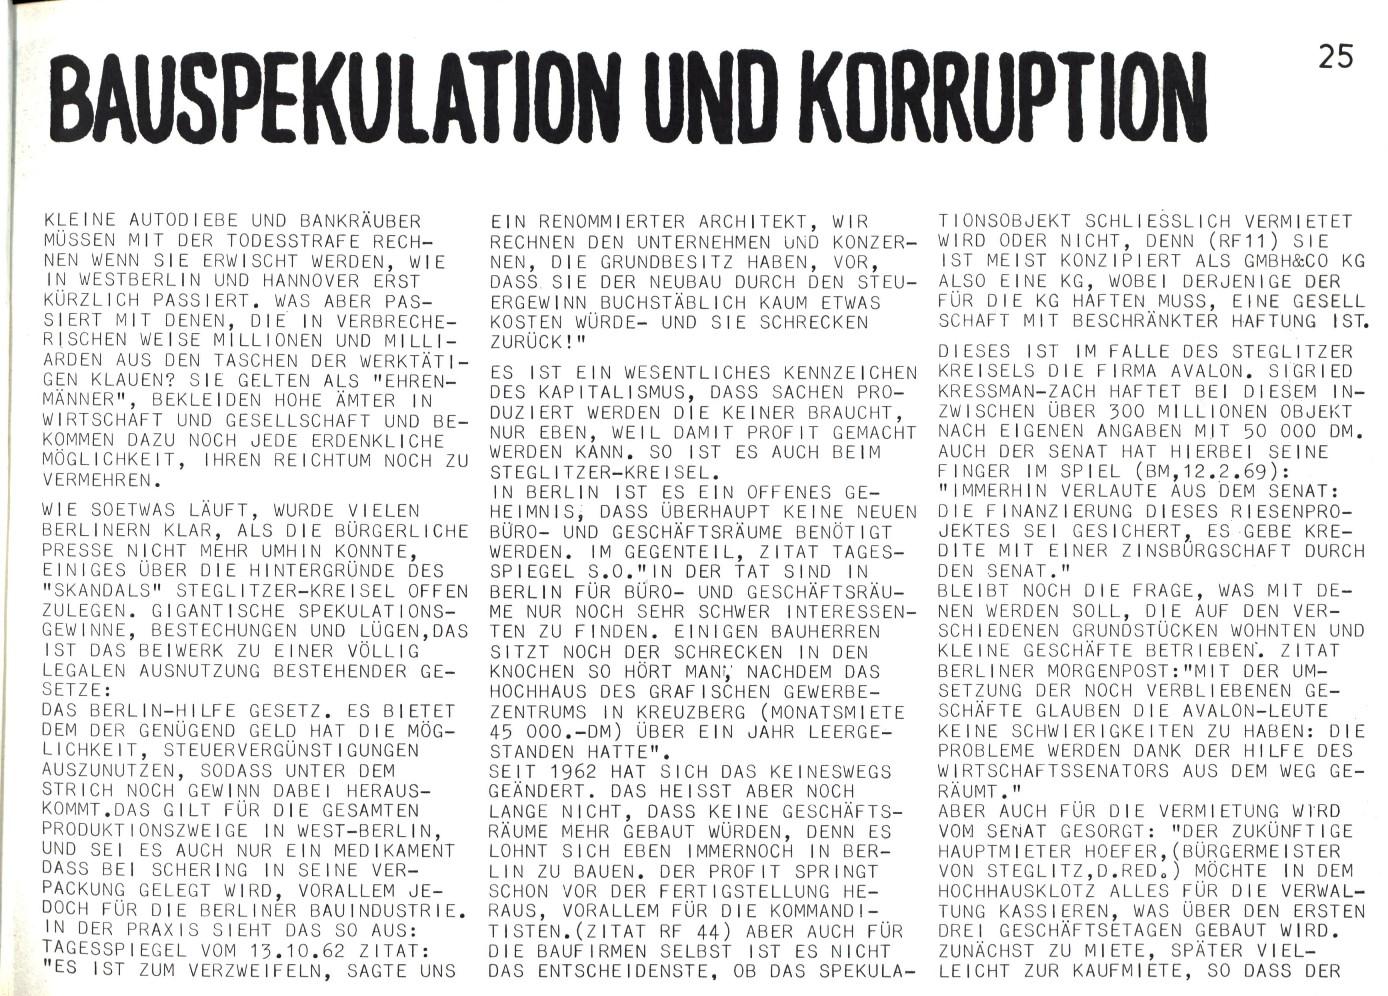 Berlin_KSV_1974_Rote_Bauwochen_35